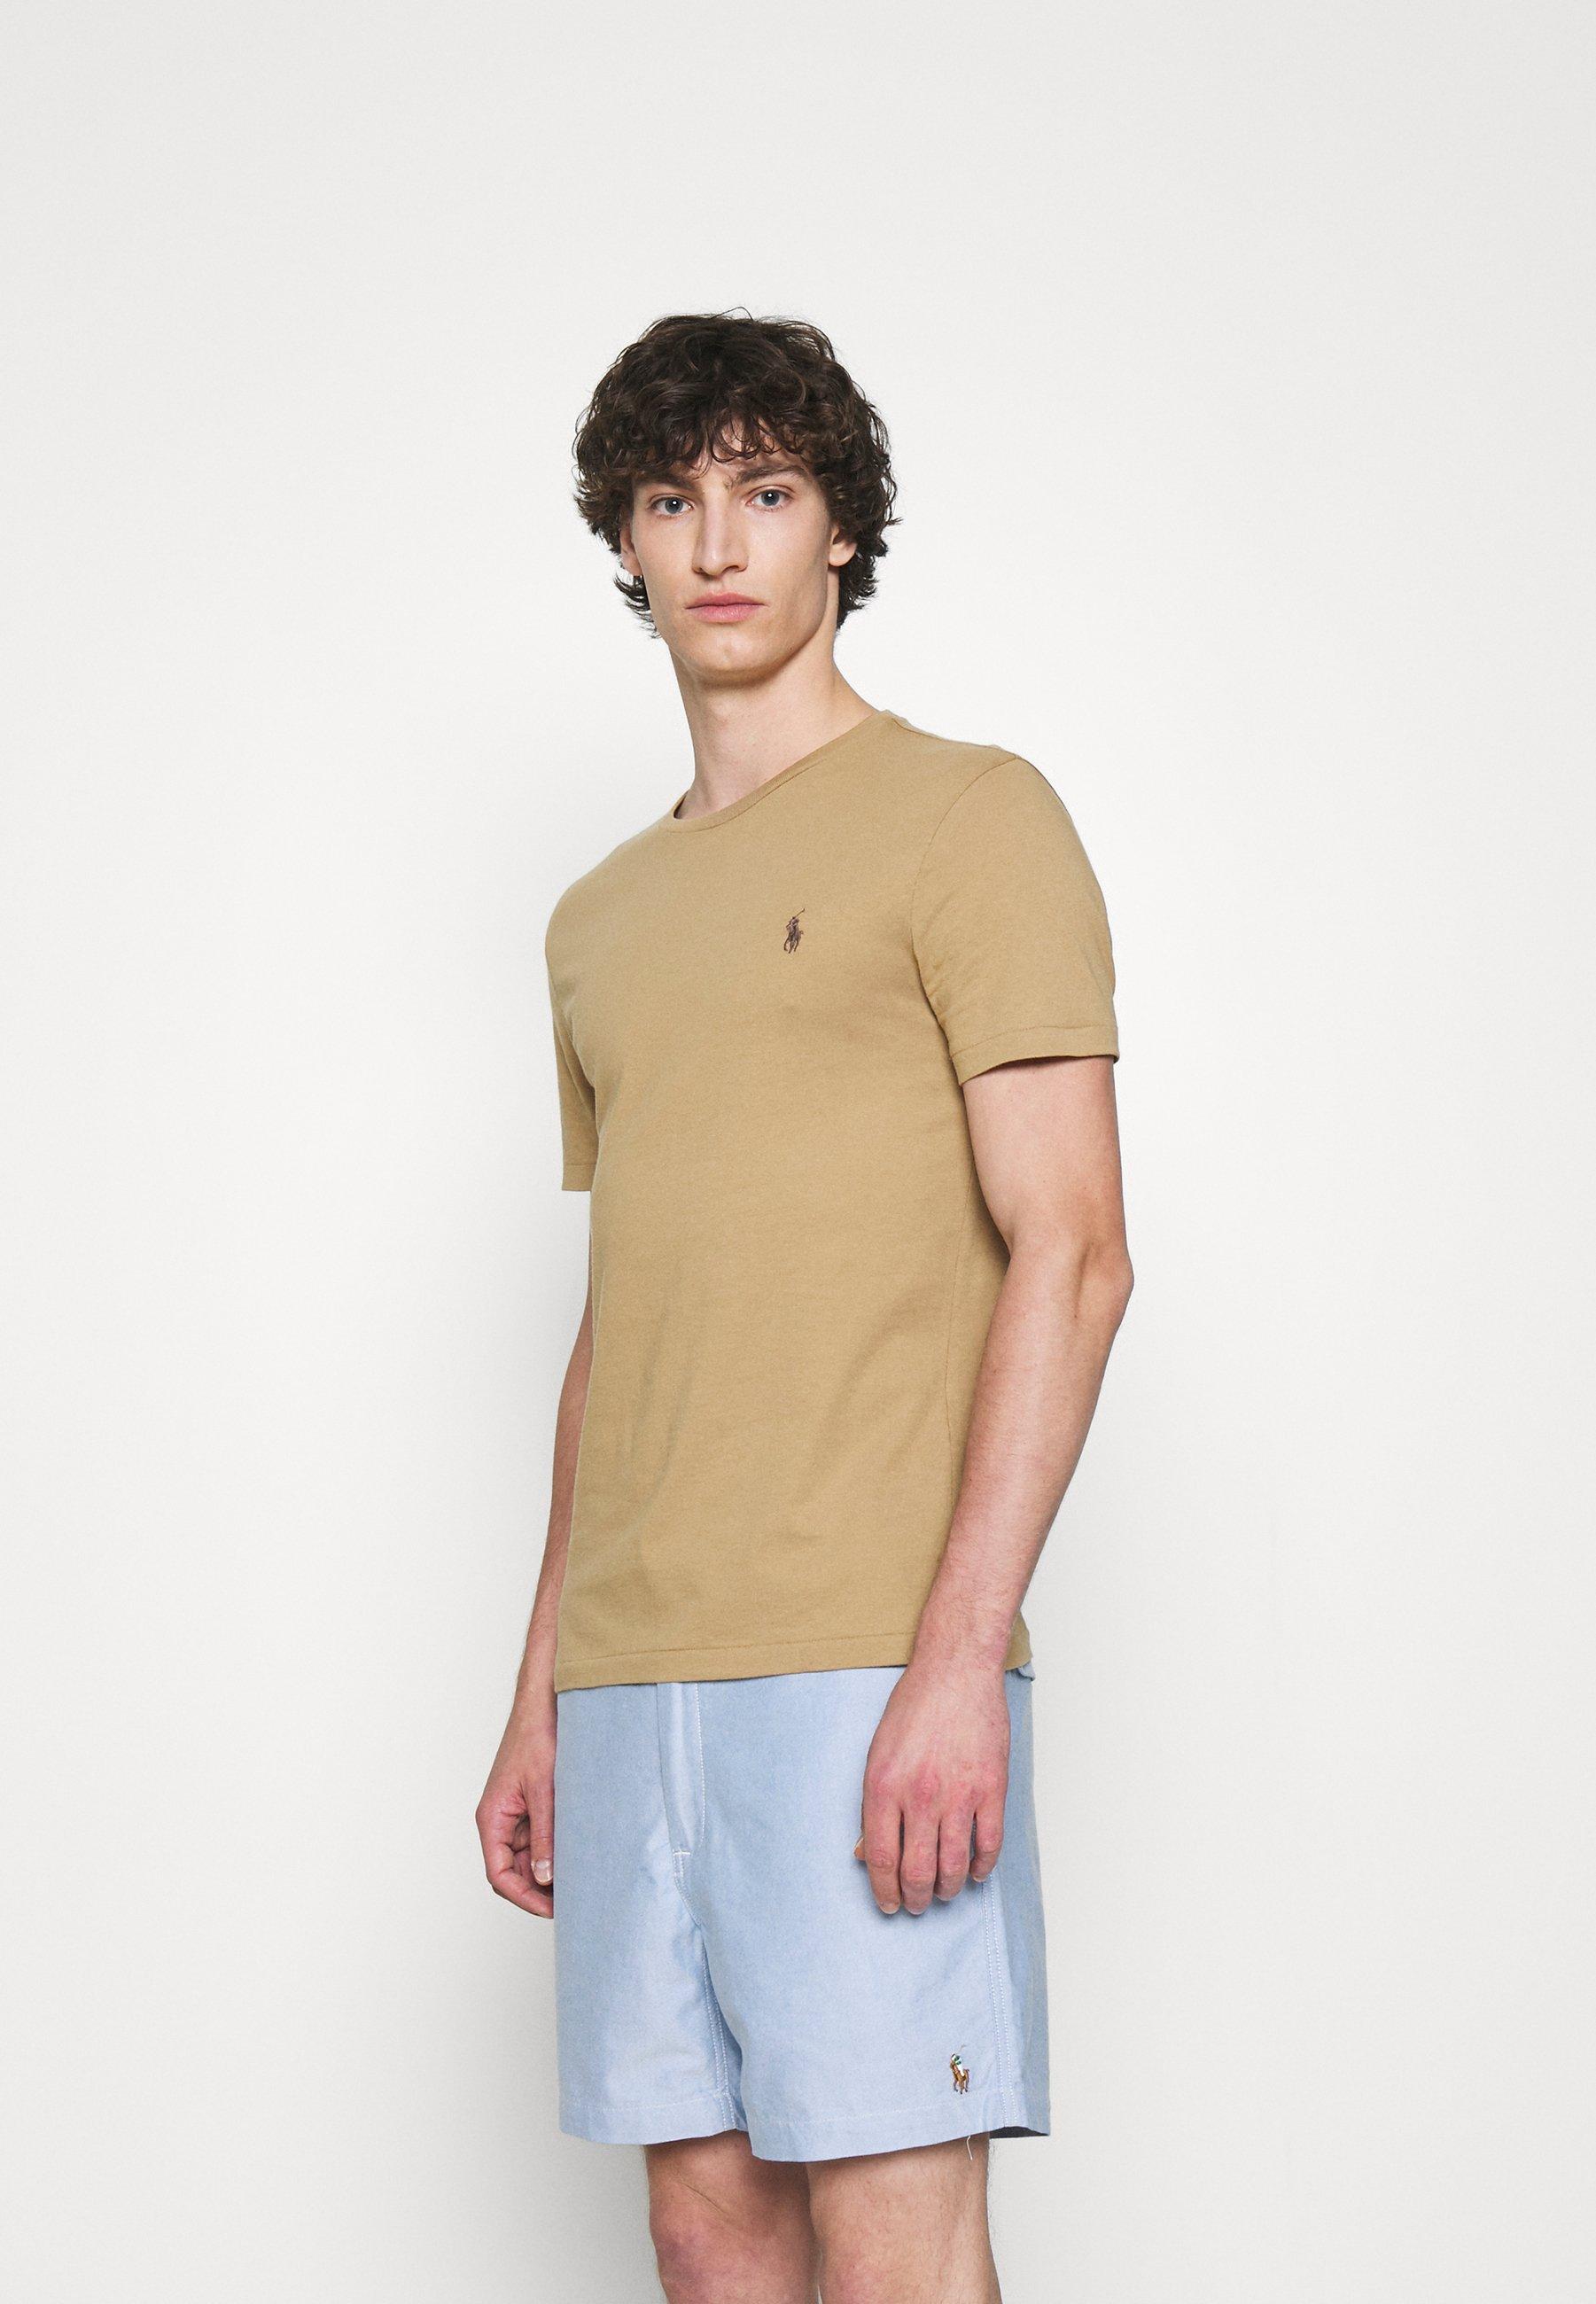 Herrer CUSTOM SLIM FIT JERSEY CREWNECK T-SHIRT - T-shirts basic